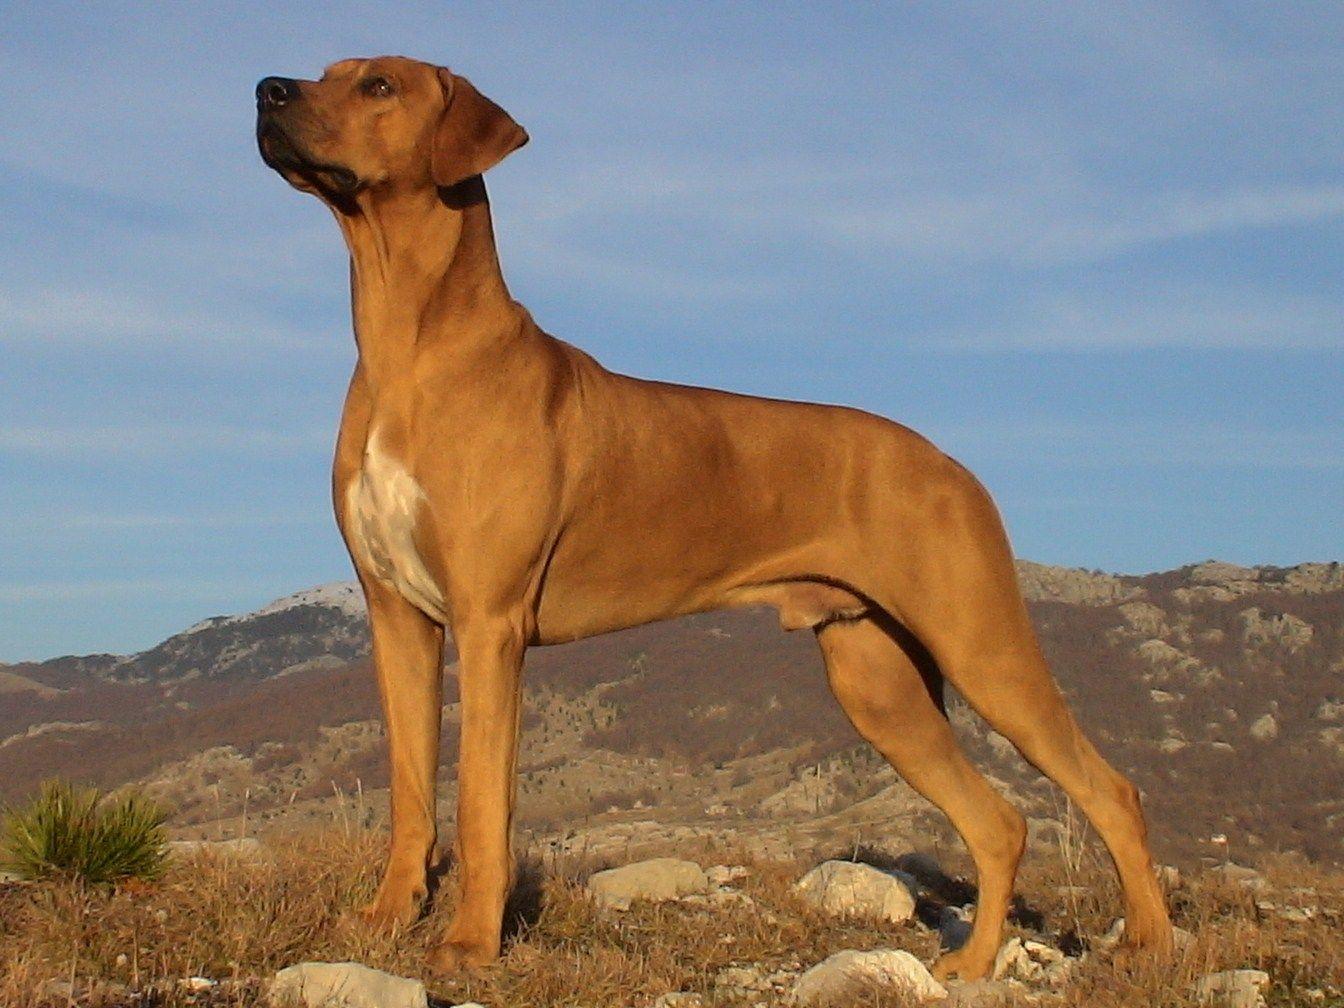 Rhodesian Ridgeback Rhodesian Ridgeback Dogs Large Dog Breeds Rhodesian Ridgeback Rhodesian Ridgeback Dog